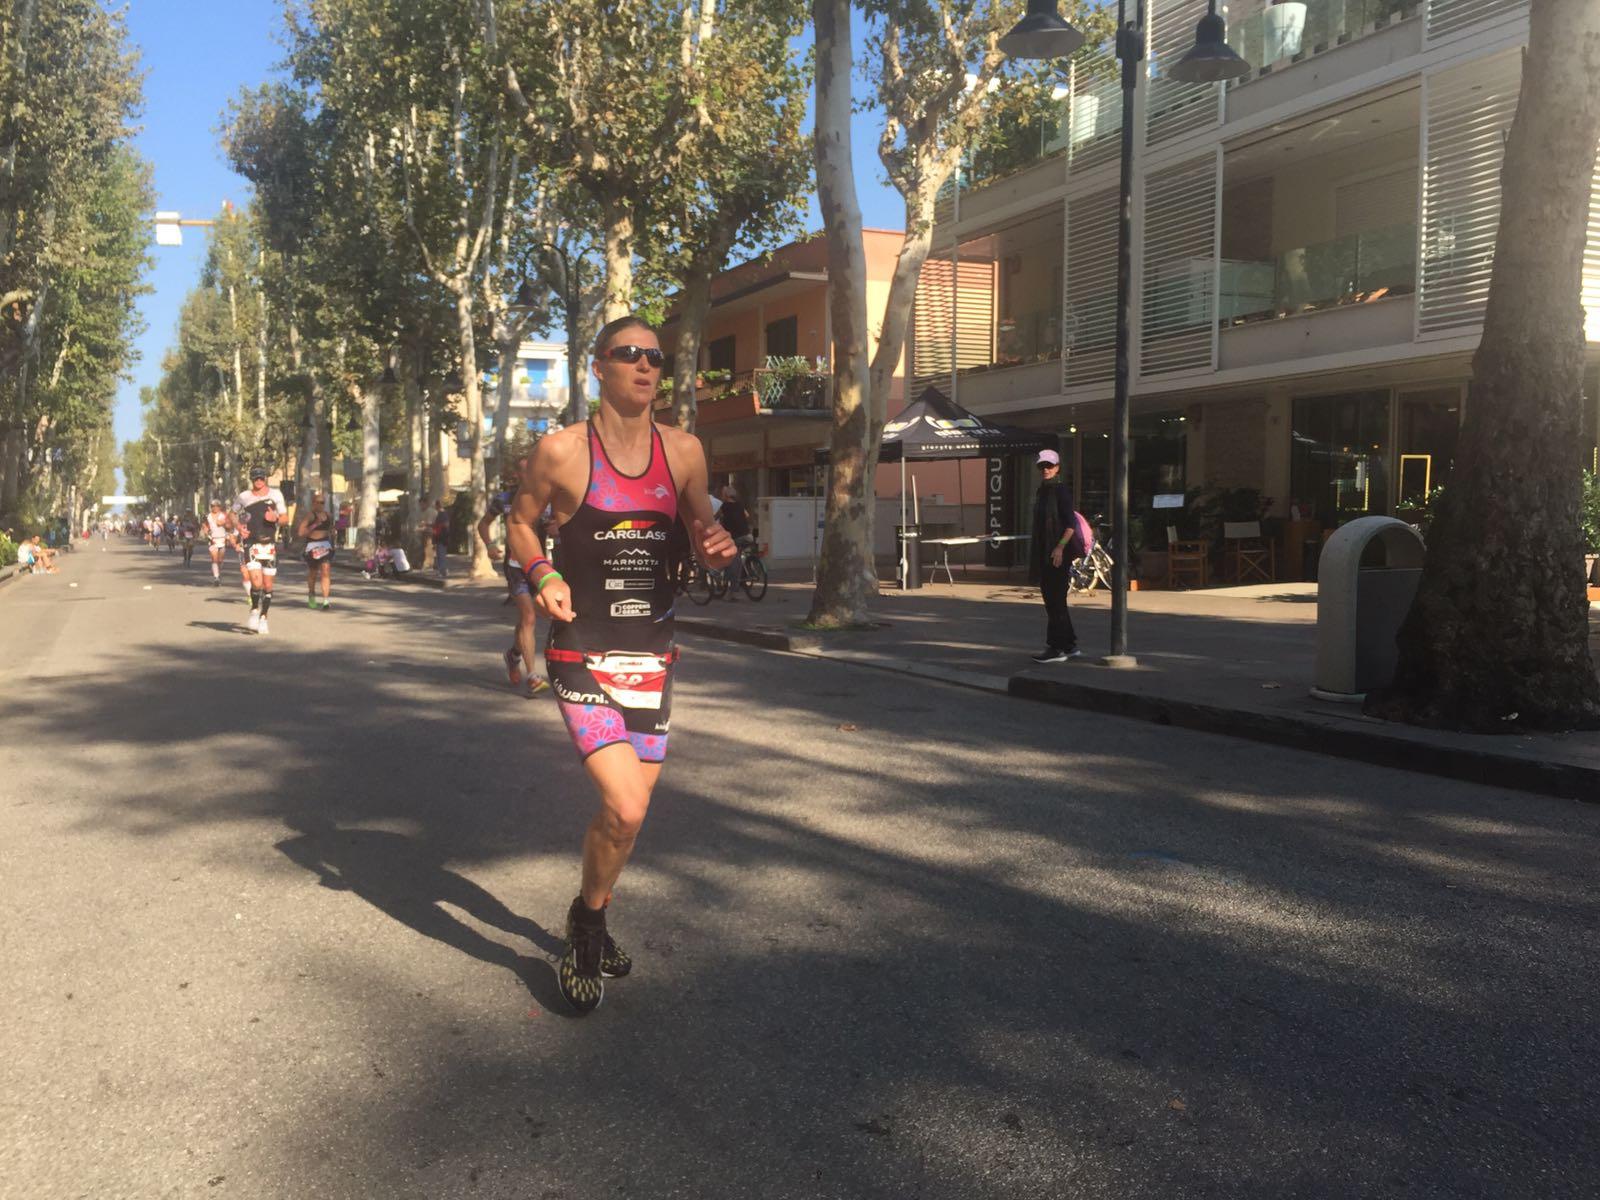 Tine Deckers Emilia Romagna Ironman run